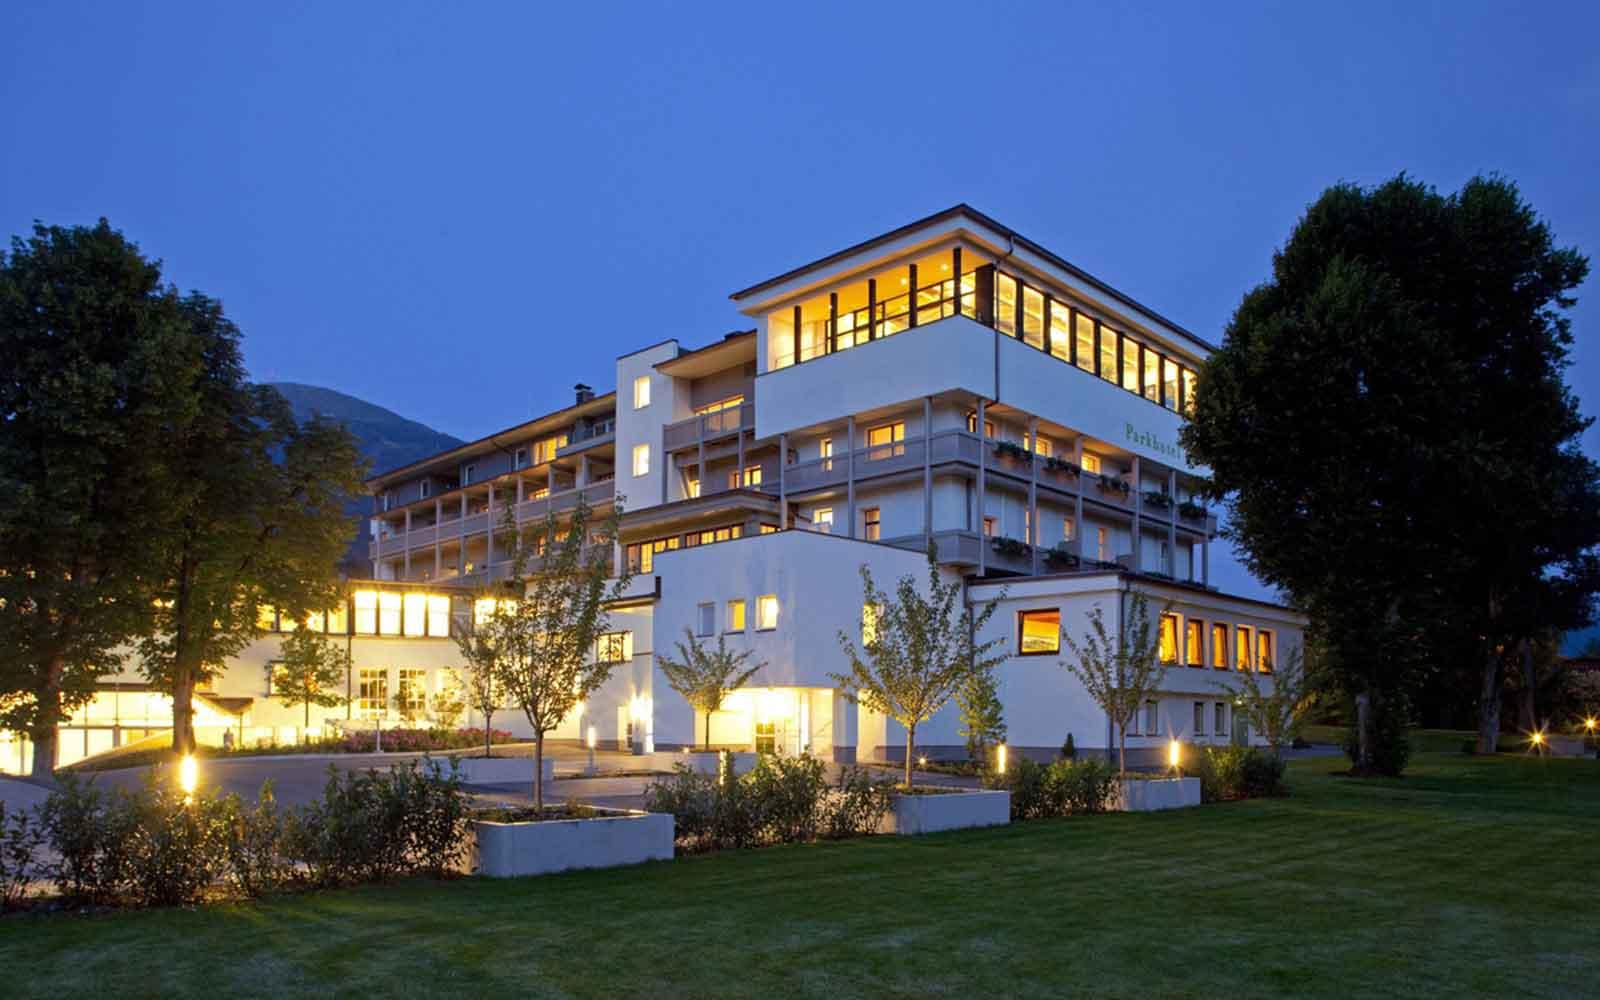 Modern Mayr's comprehensive diagnostic module Park Igls Tyrol Austria Hotel Health & Wellbeing